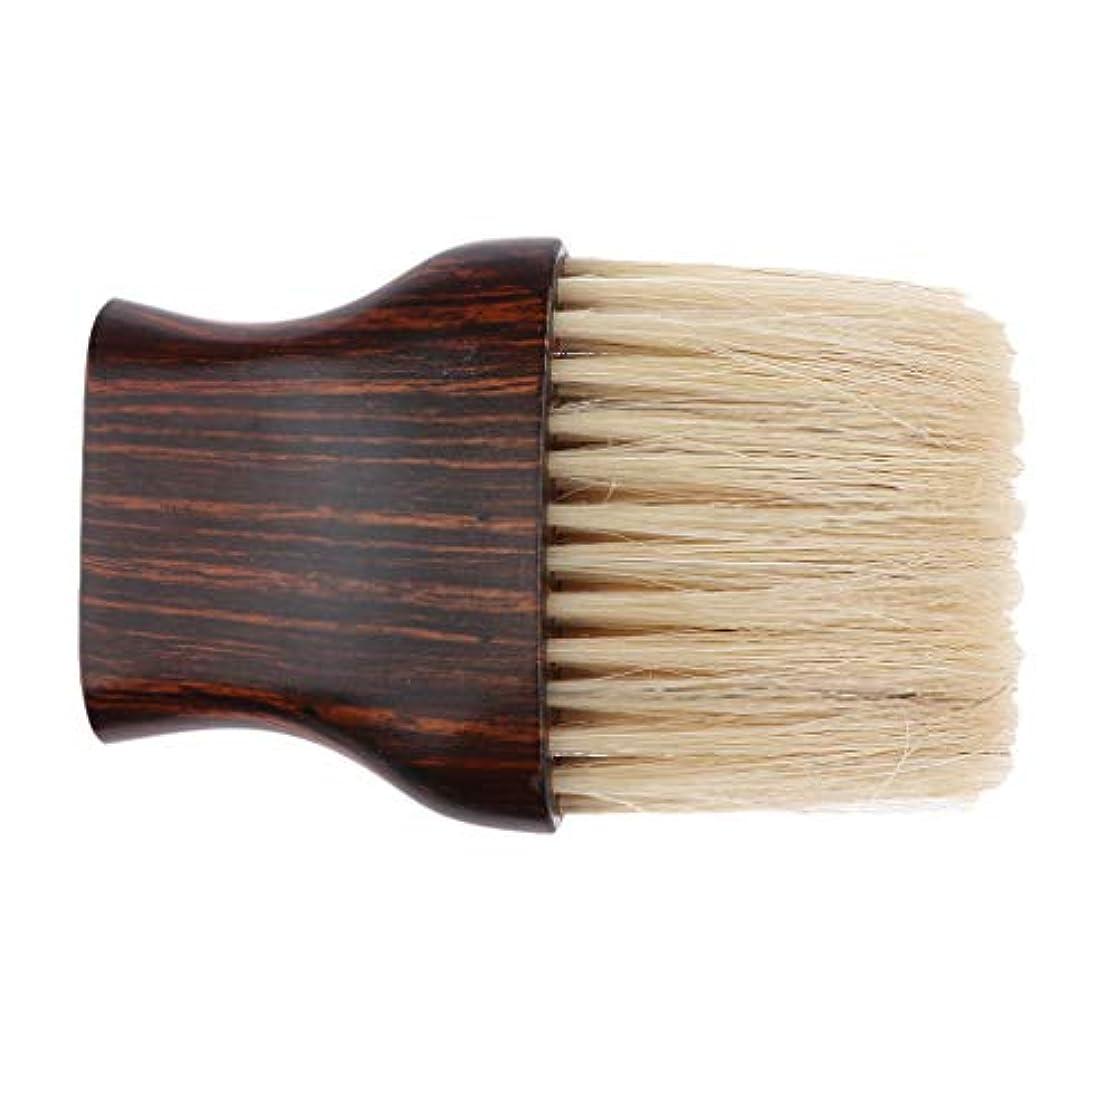 Perfeclan ヘアブラシ 毛払いブラシ 木製ハンドル 散髪 髪切り 散髪用ツール 理髪店 美容院 ソフトブラシ